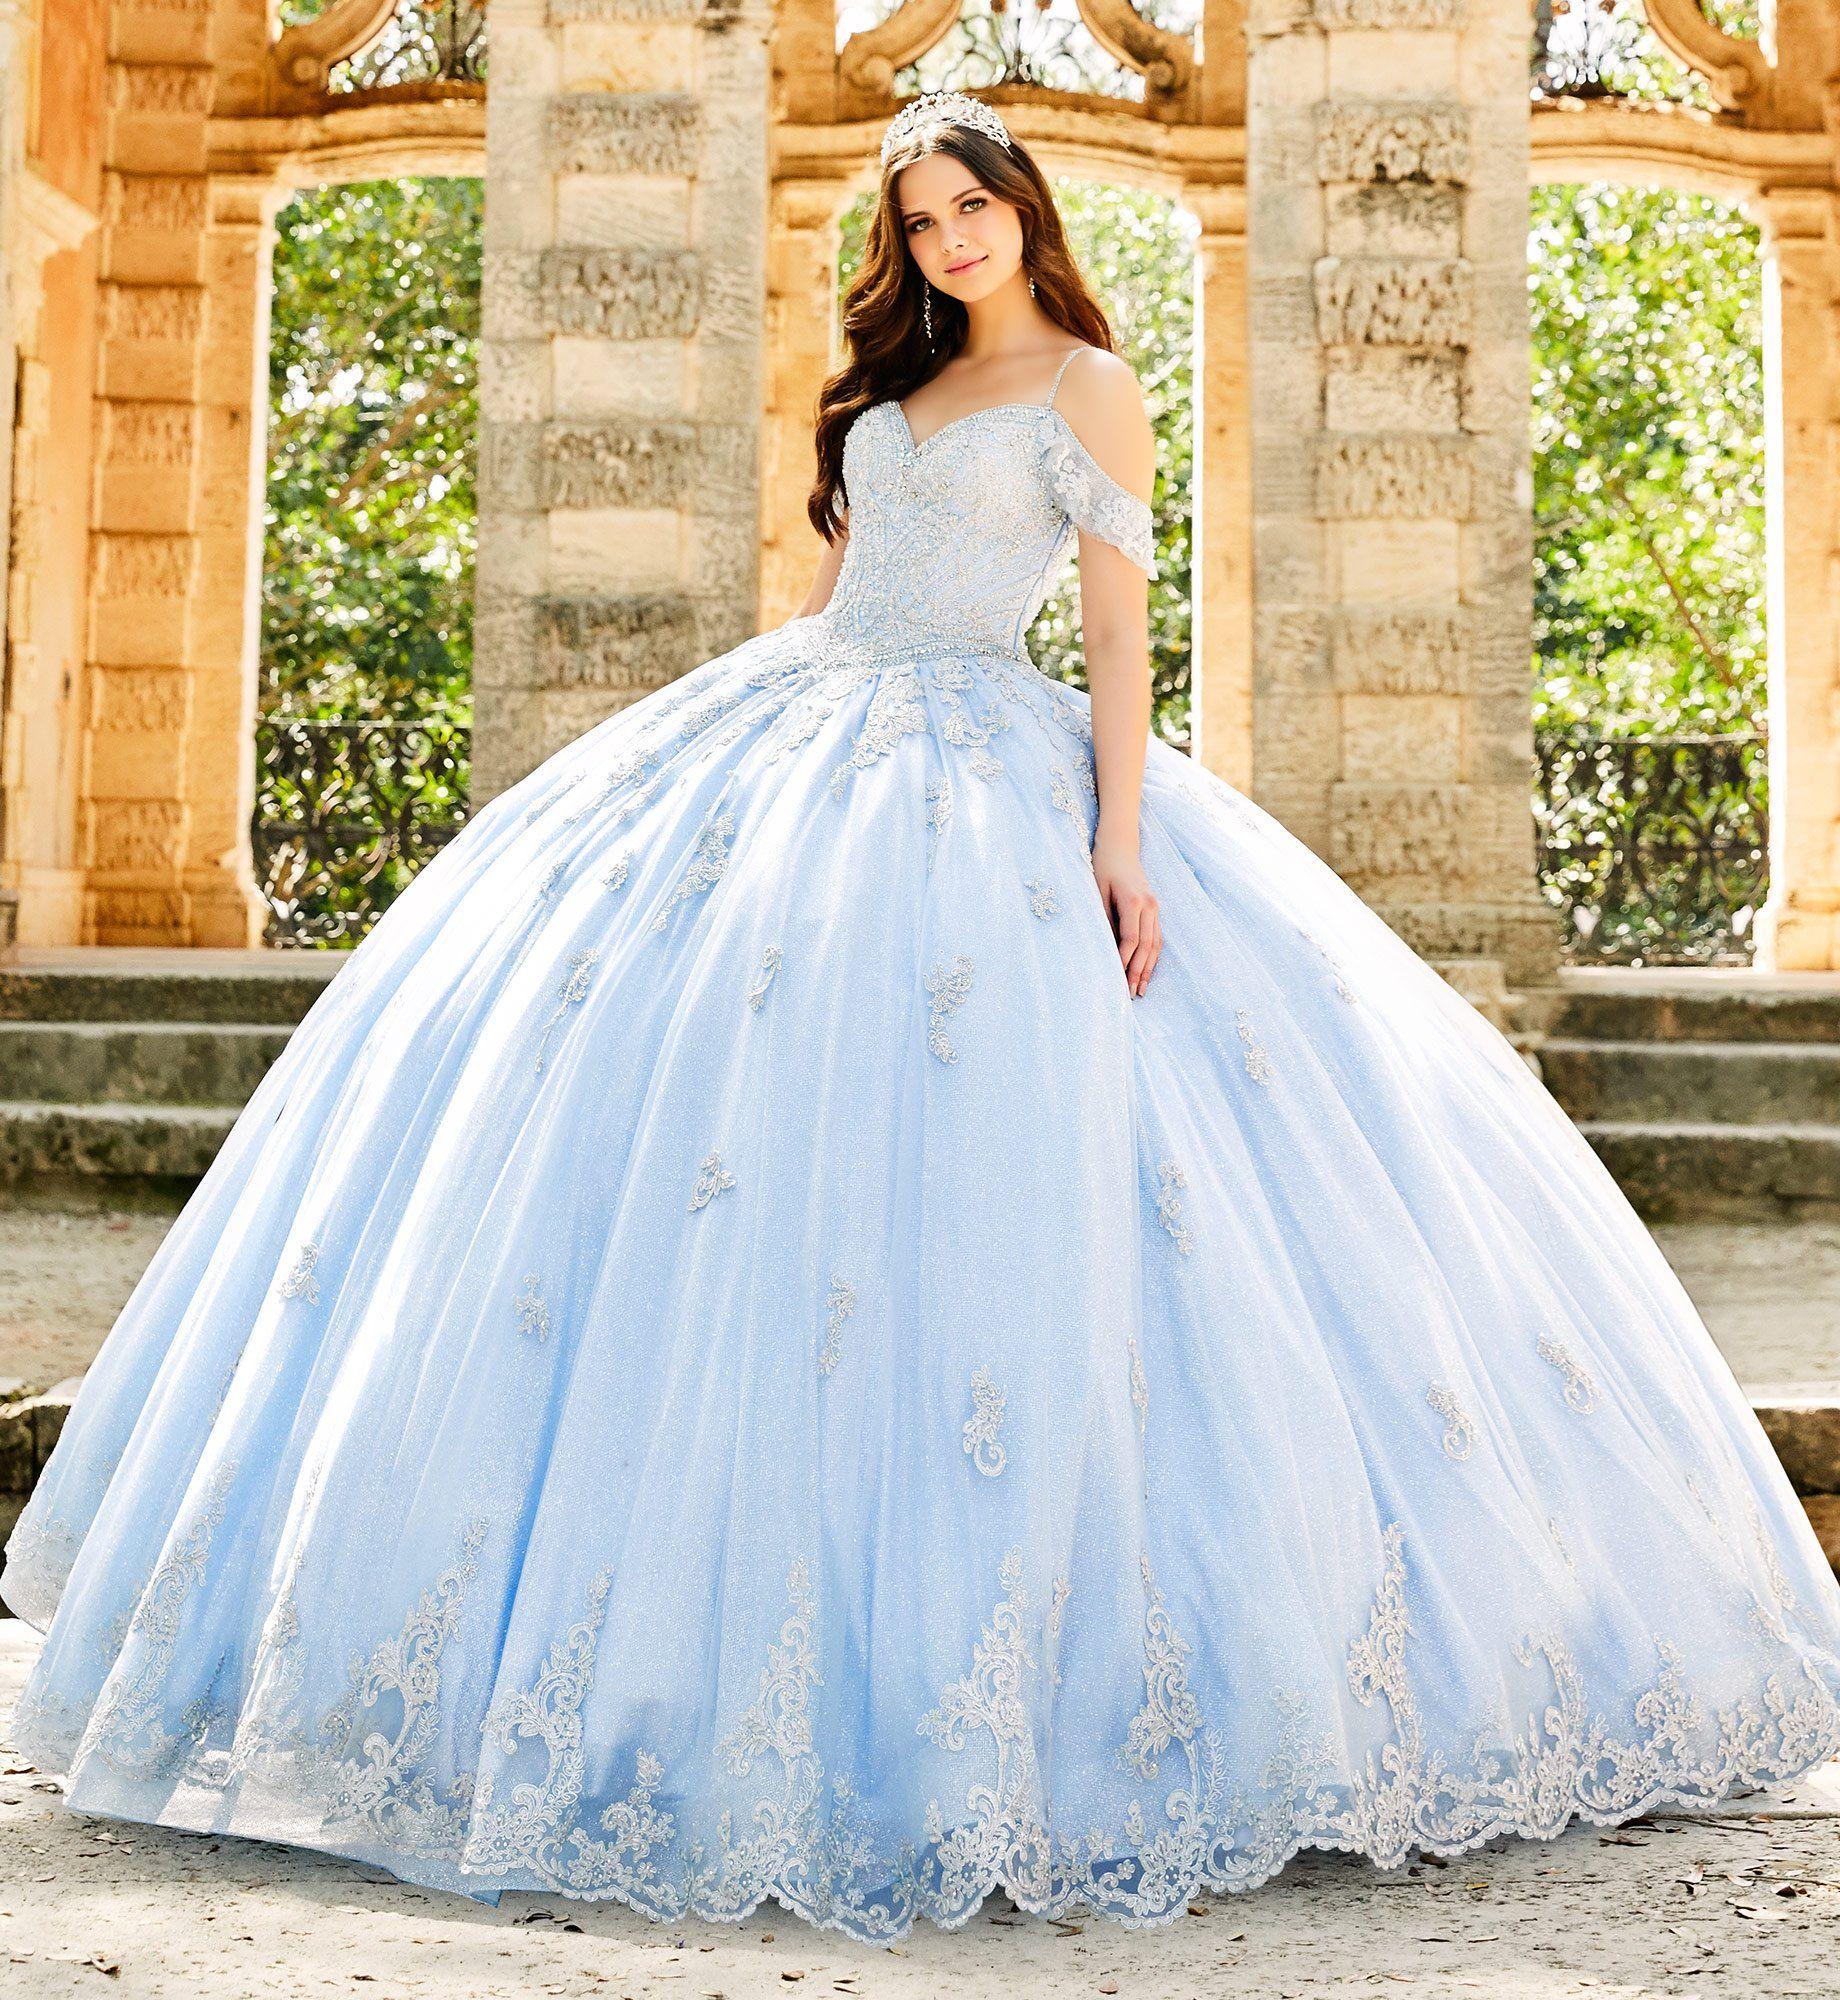 Princesa By Ariana Vara Pr22032 Quinceanera Dress In 2021 Quinceanera Dresses Blue Light Blue Quinceanera Dresses Quinceanera Dresses [ 2000 x 1840 Pixel ]